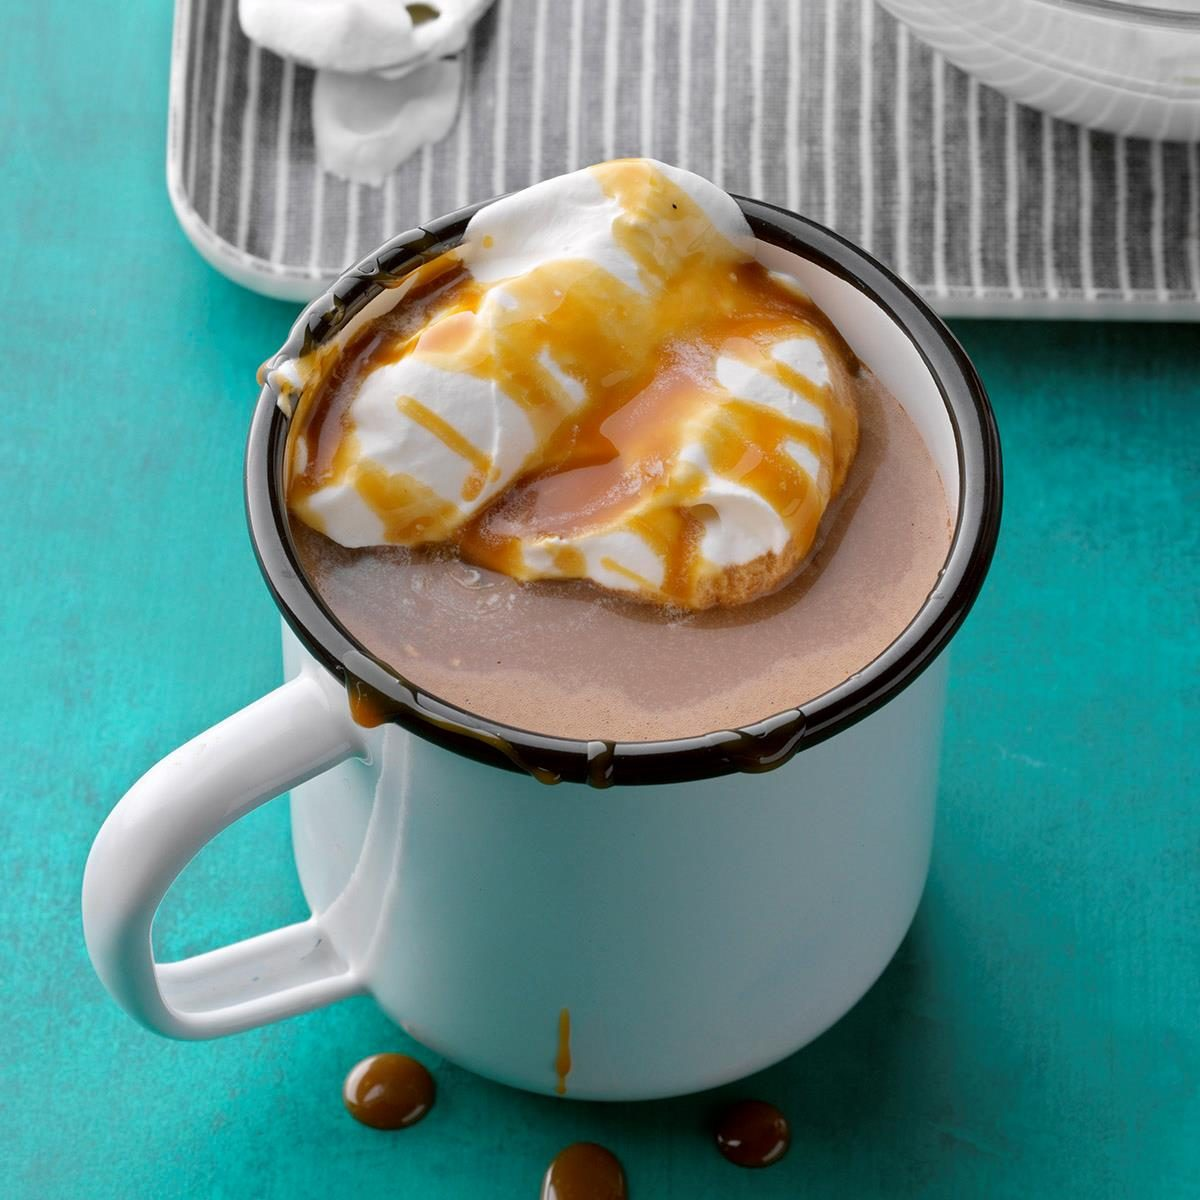 High School Age: Salted Caramel and Banana Hot Chocolate